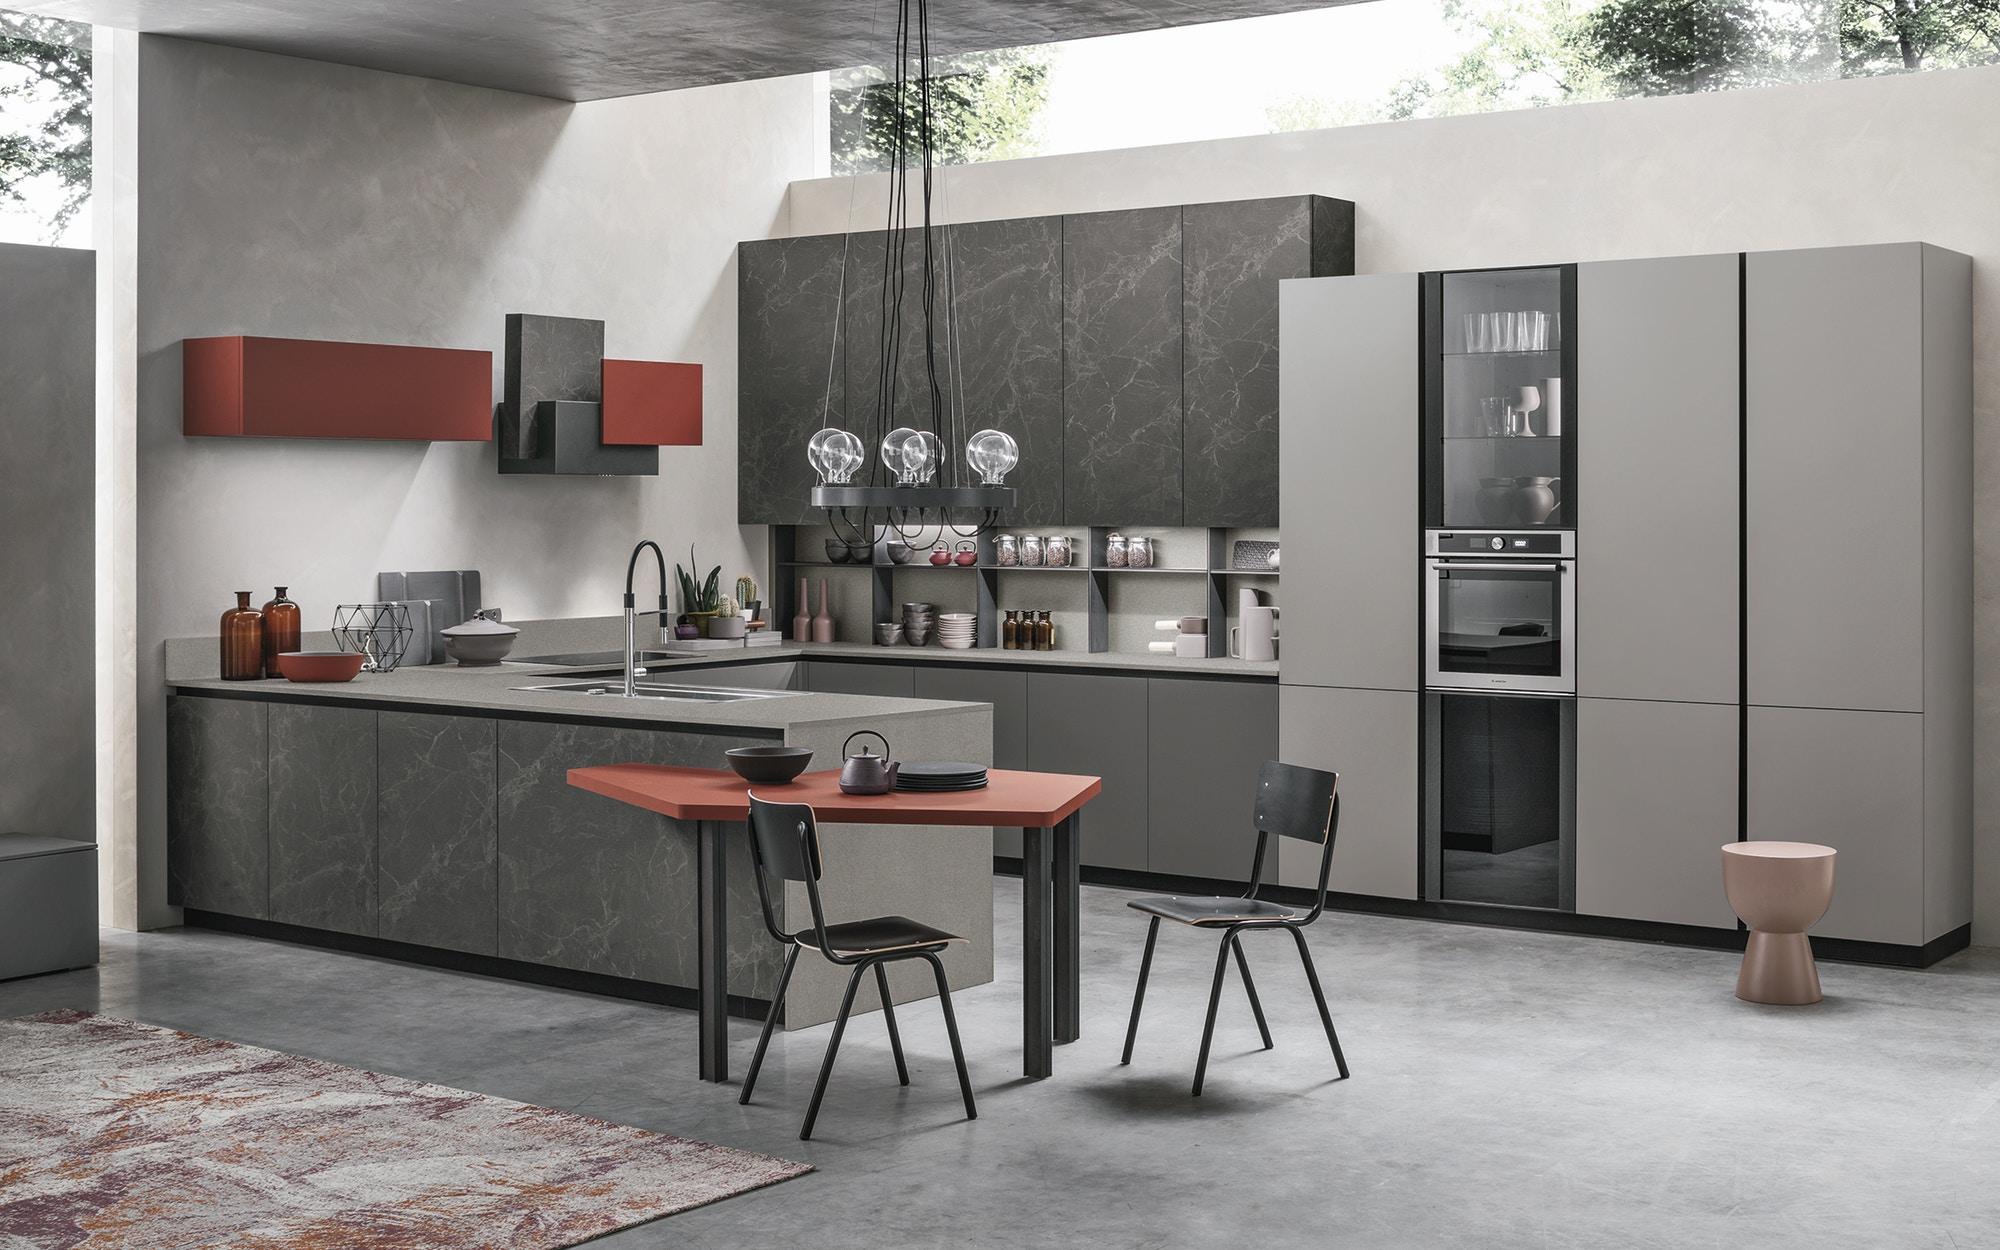 Metropolis prowood stosa cucine milano for Cucine moderne scure